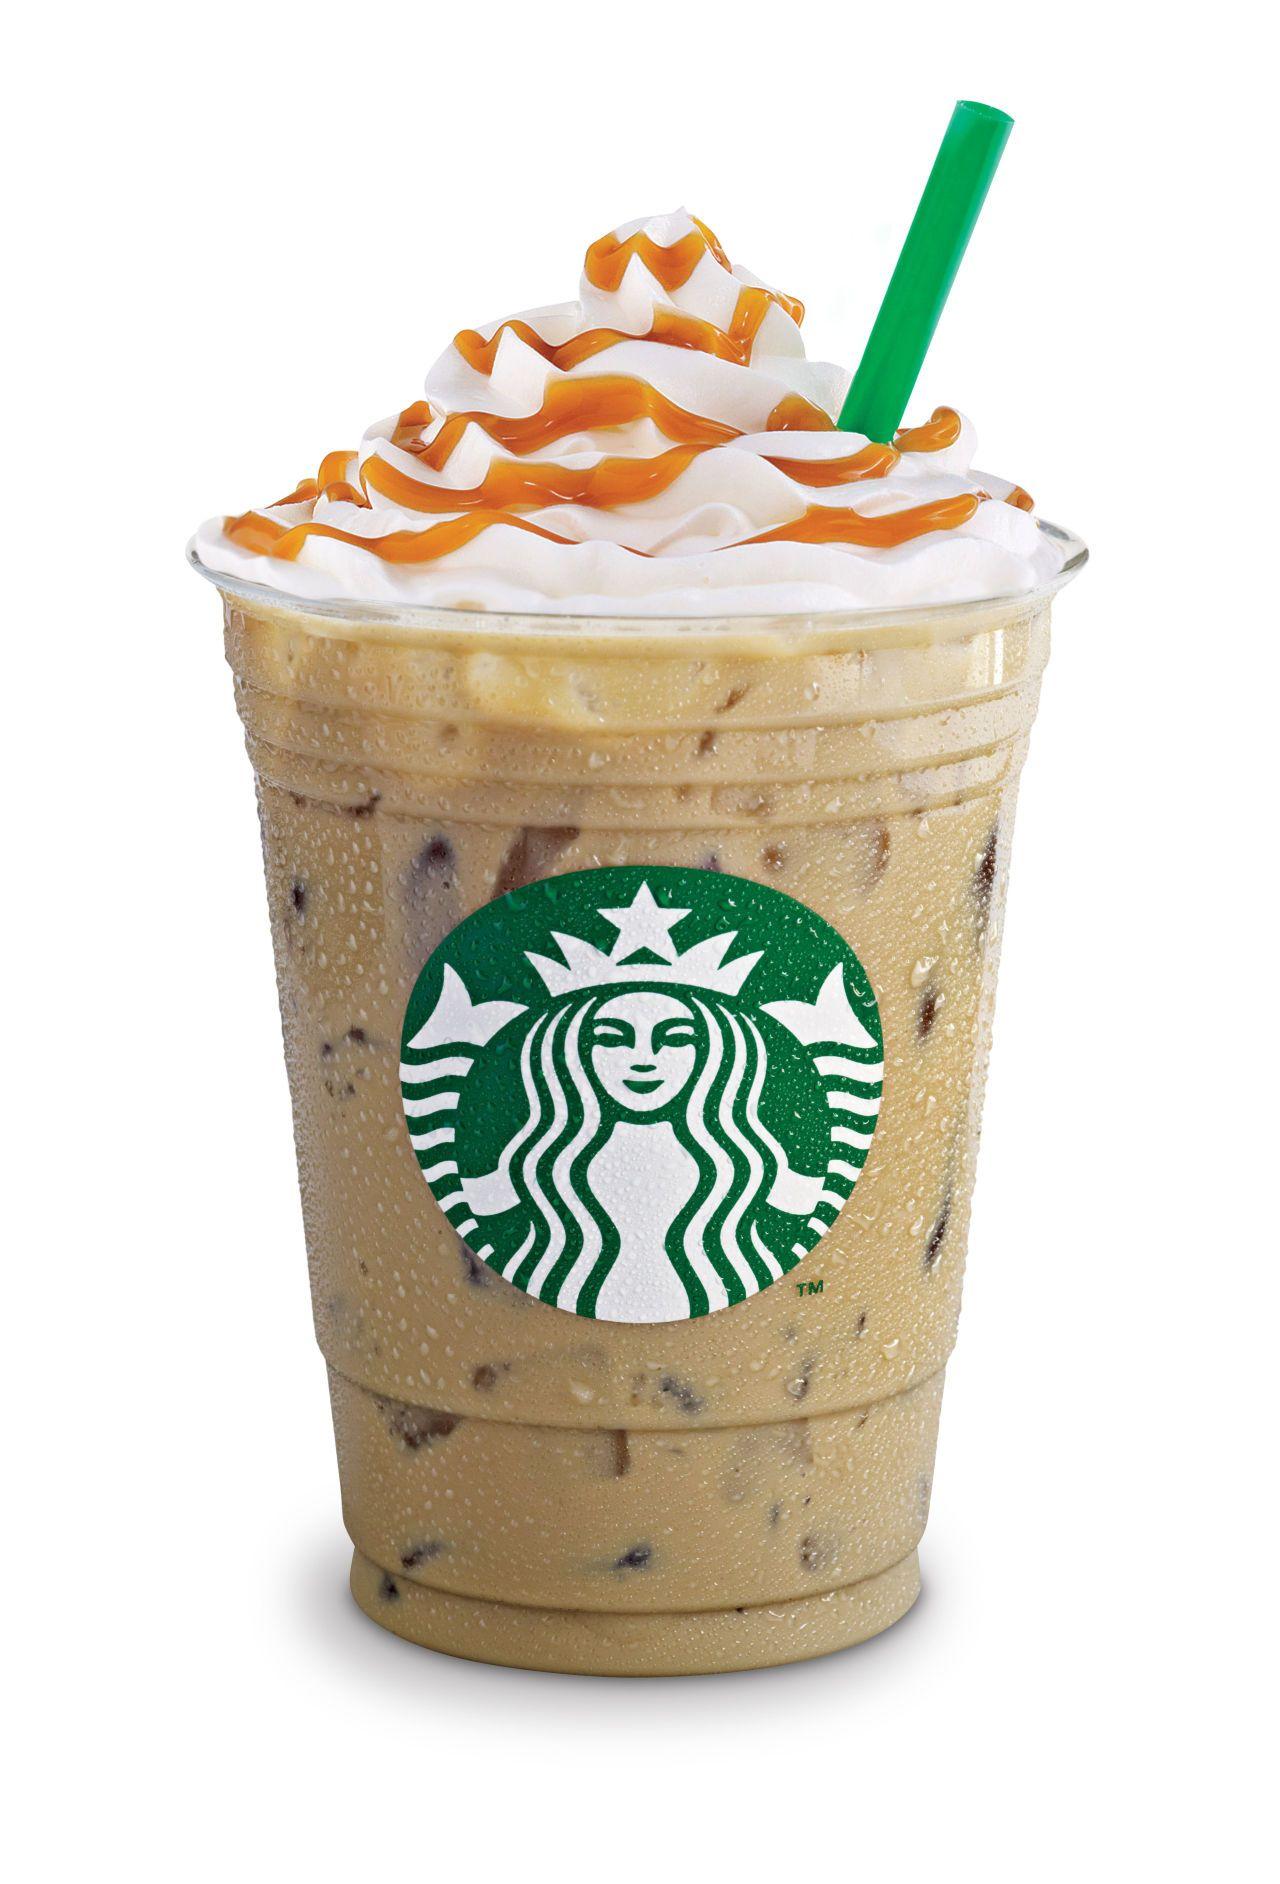 15 Most Amazing Starbucks Drinks Around the World Iced